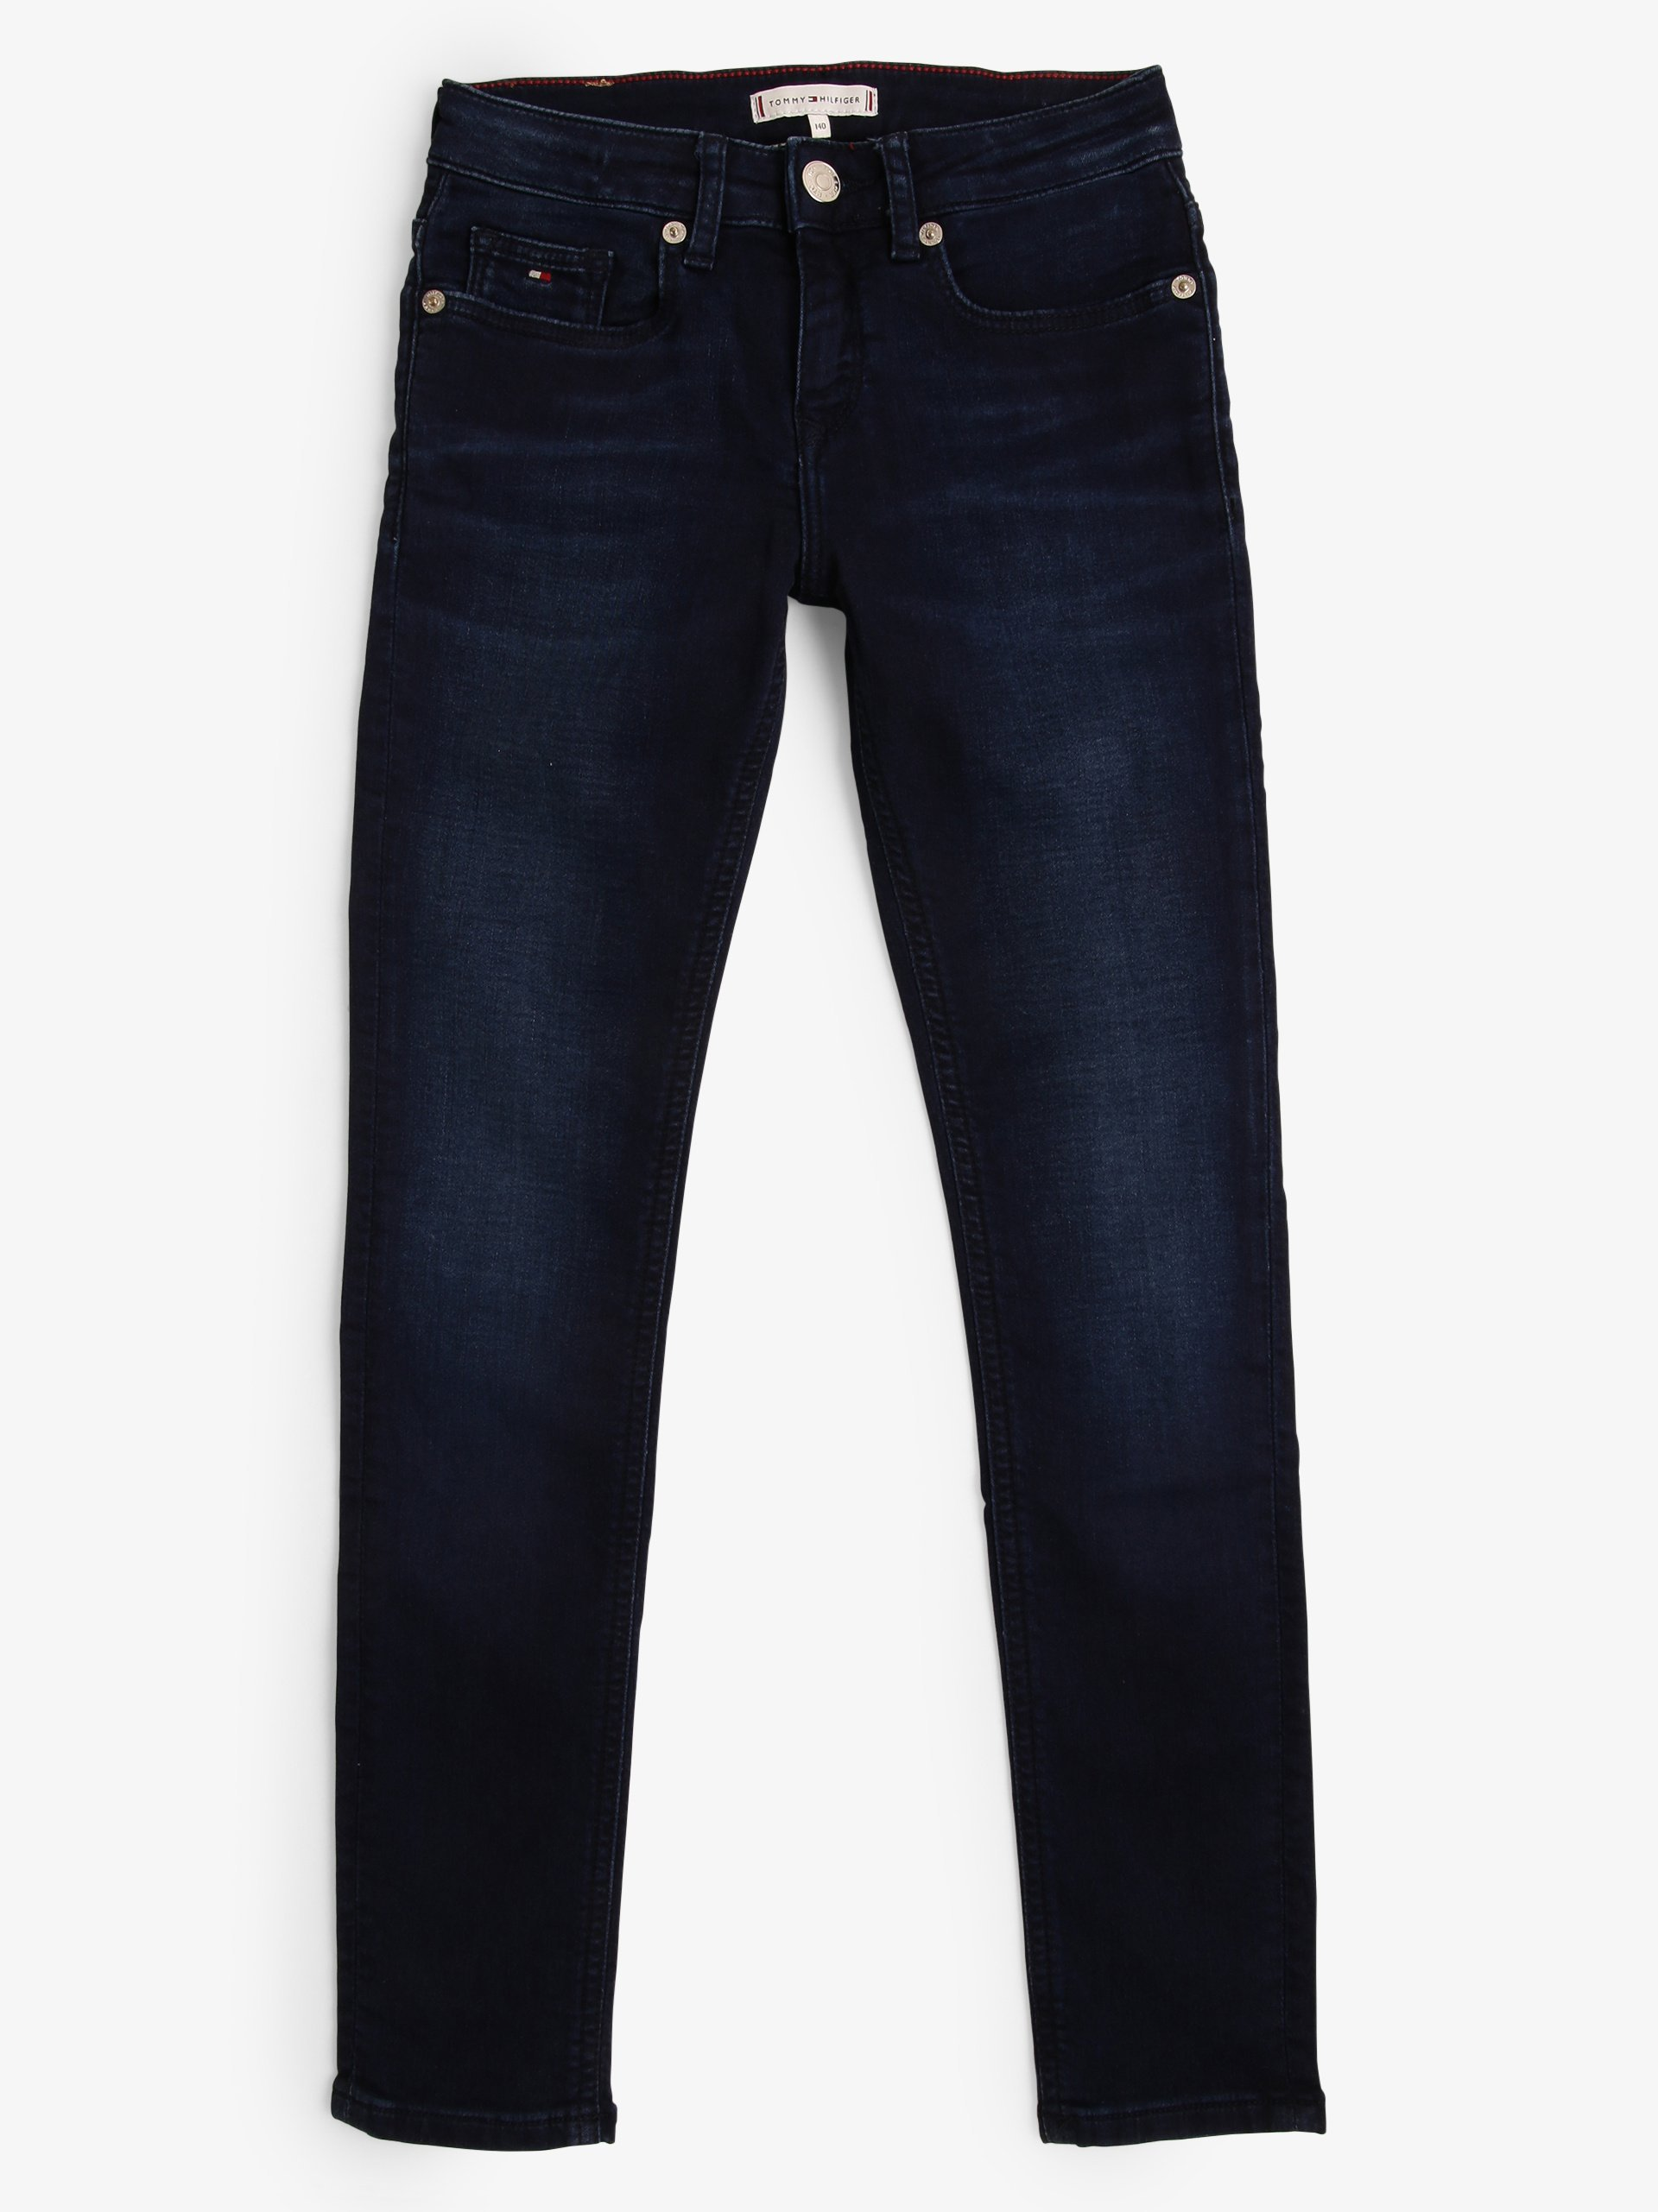 Tommy Hilfiger Mädchen Jeans - Skinny